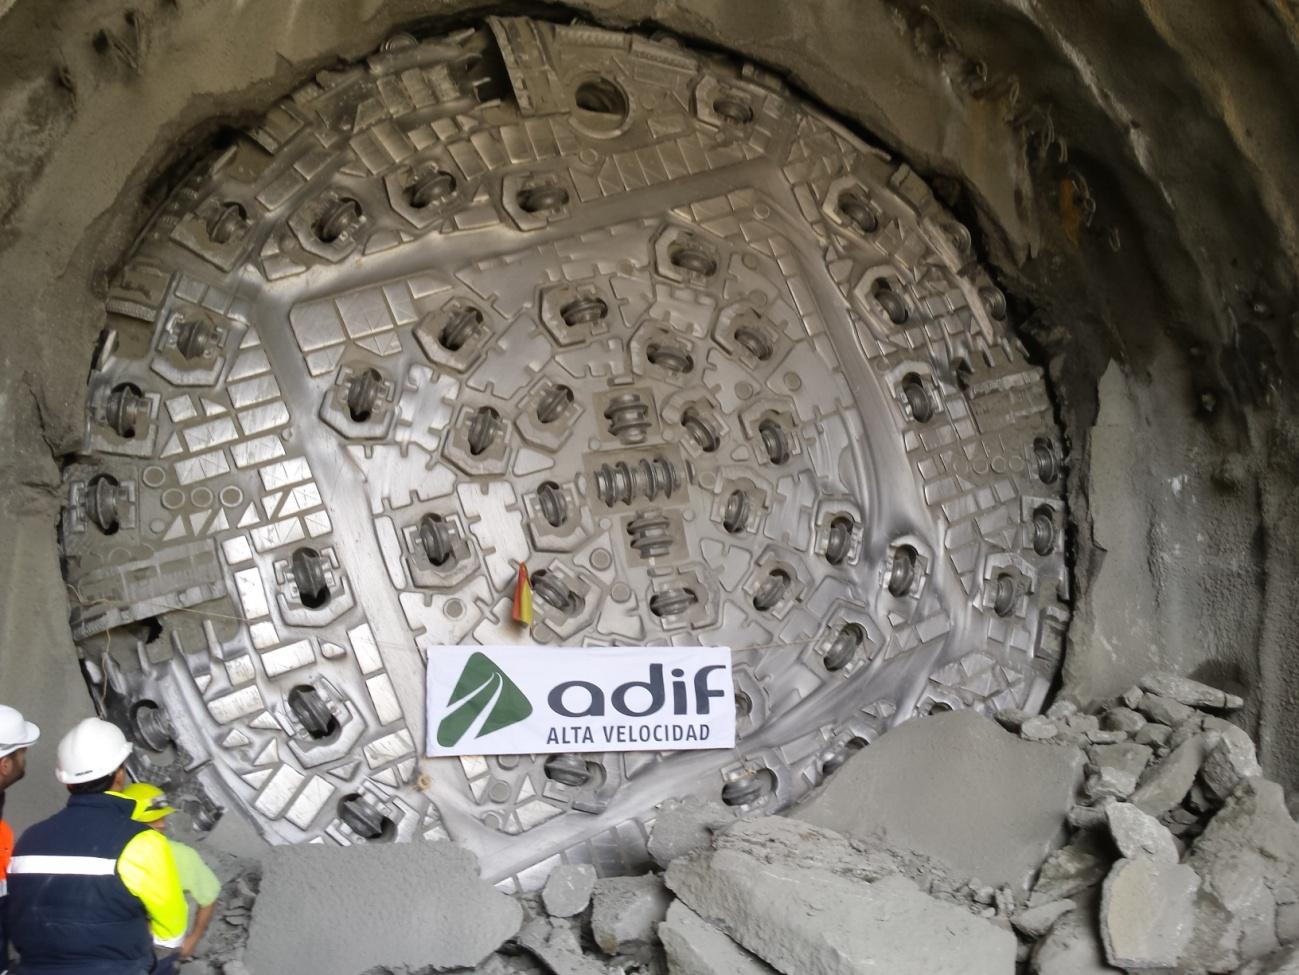 Túnel de Bolaños. Bolaños tunnel high speed rail